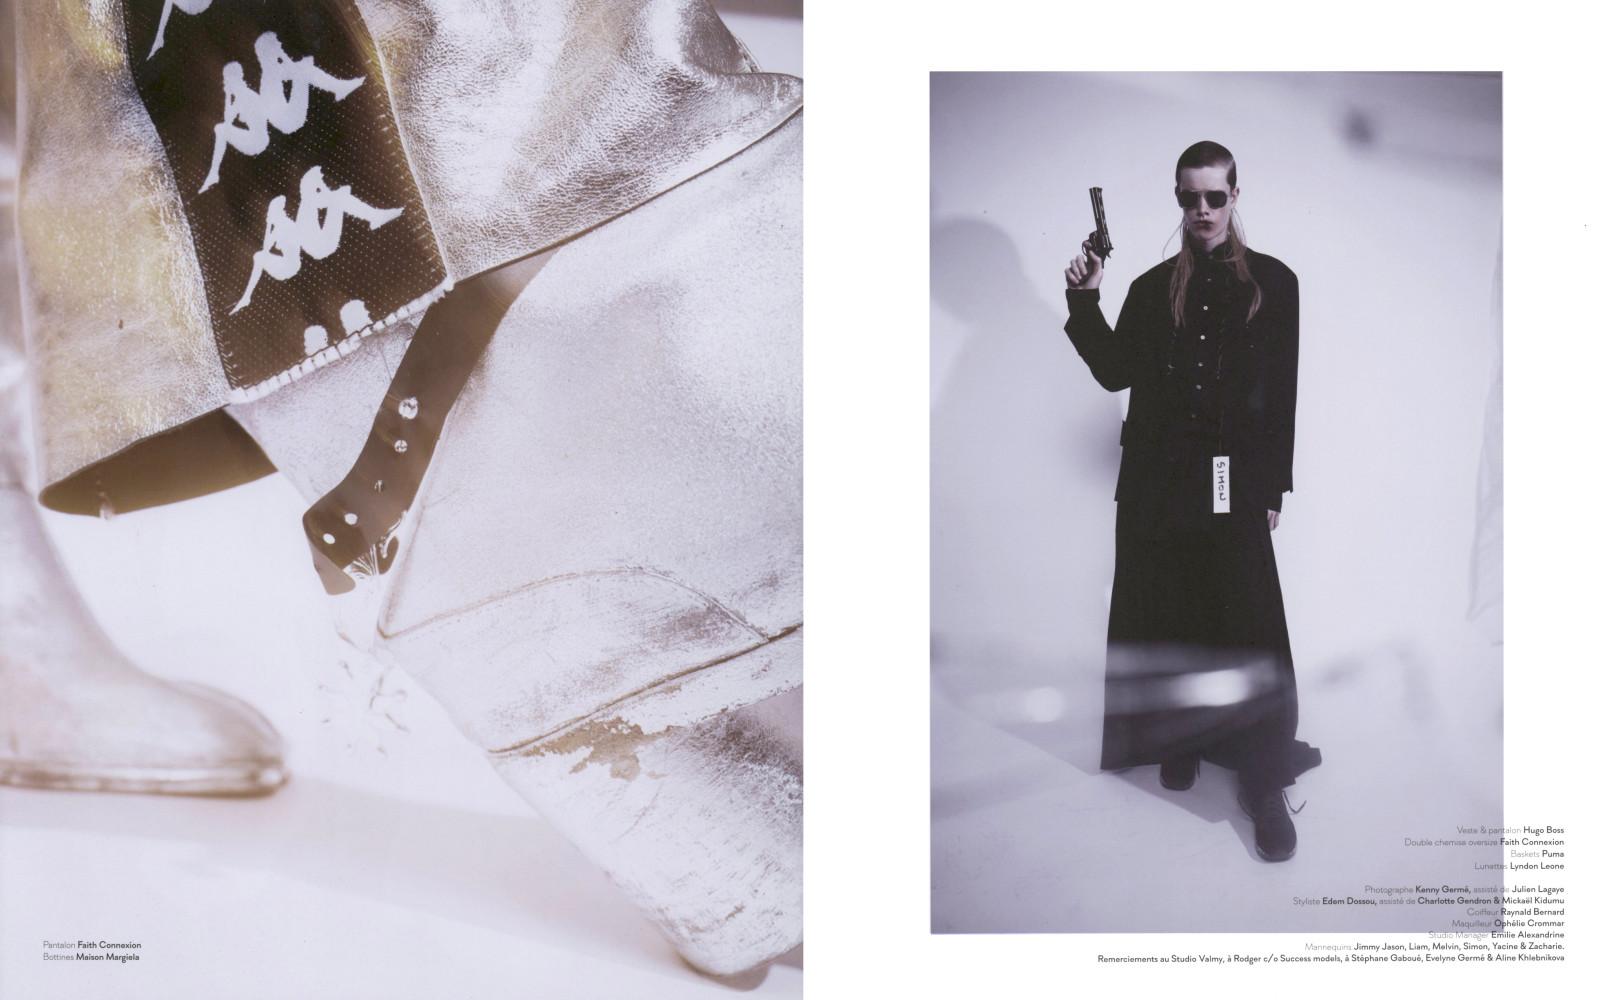 Zacharie Villot Melvin Bernier Simon Muchardt Yacine Keita for Dedicate Magazine